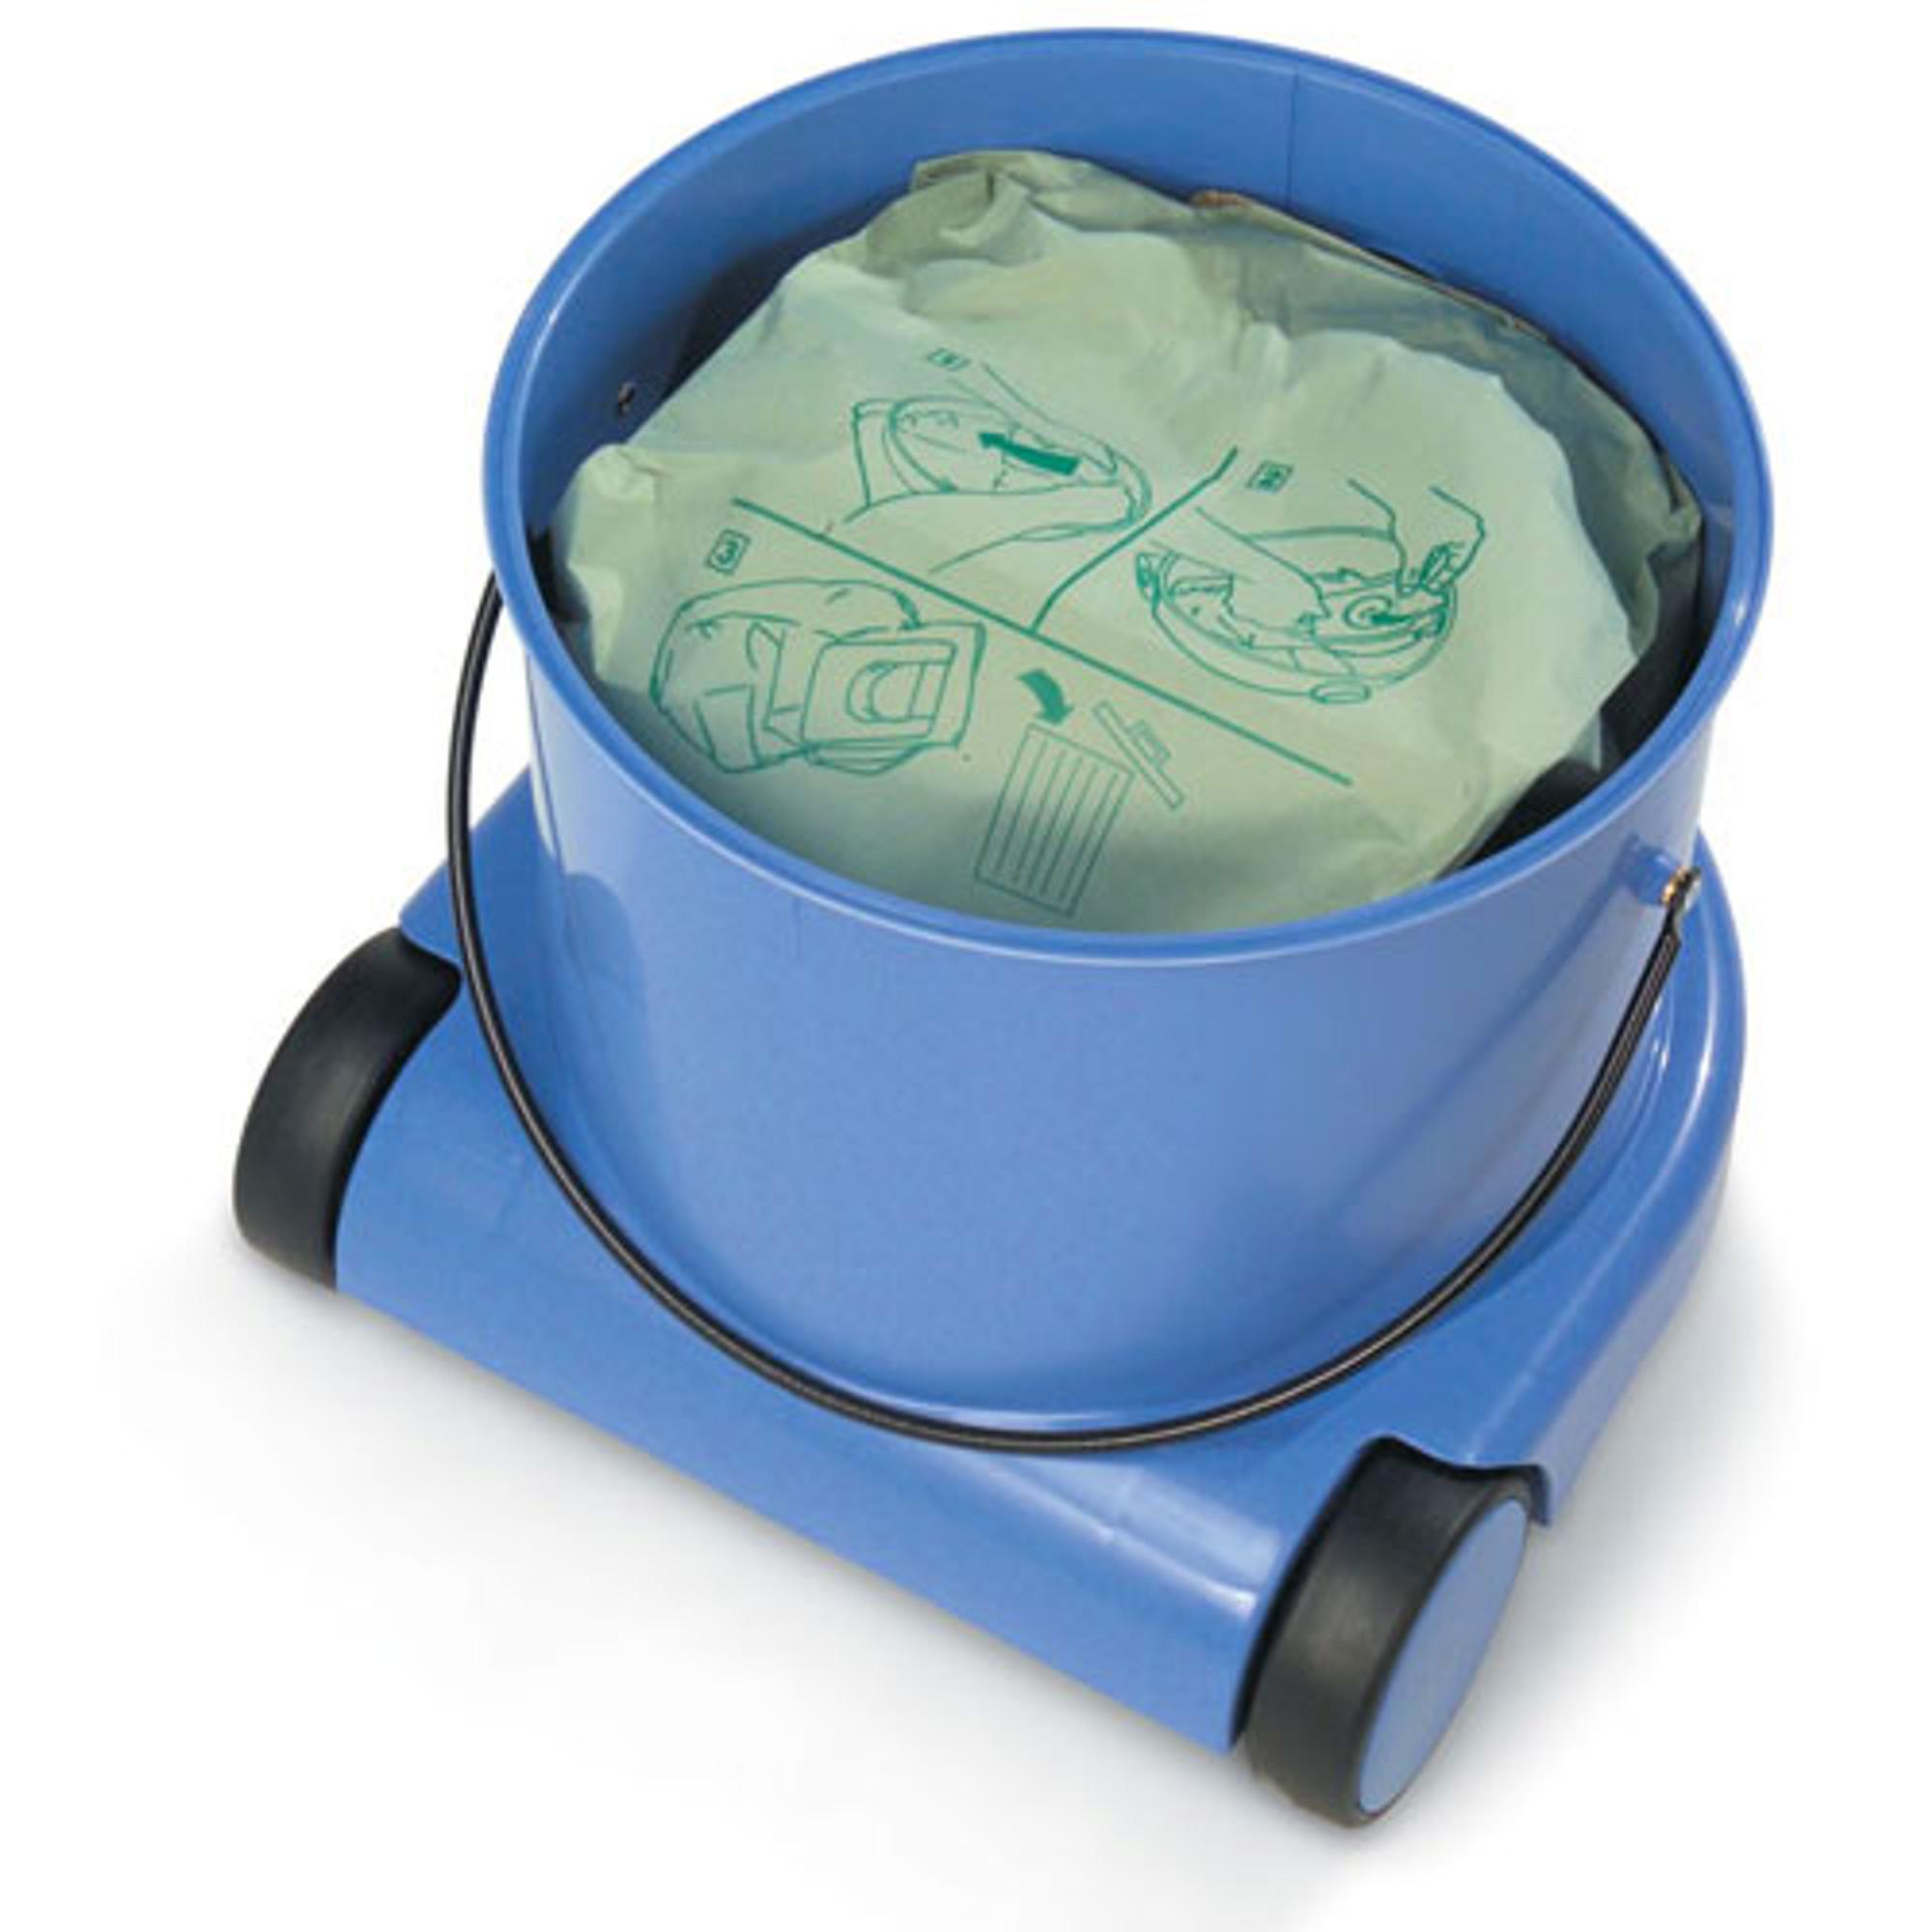 47f6405508d Bag or bagless operation. Numatic Charles CVC370 Wet Dry Vacuum Bottom of  combination ...